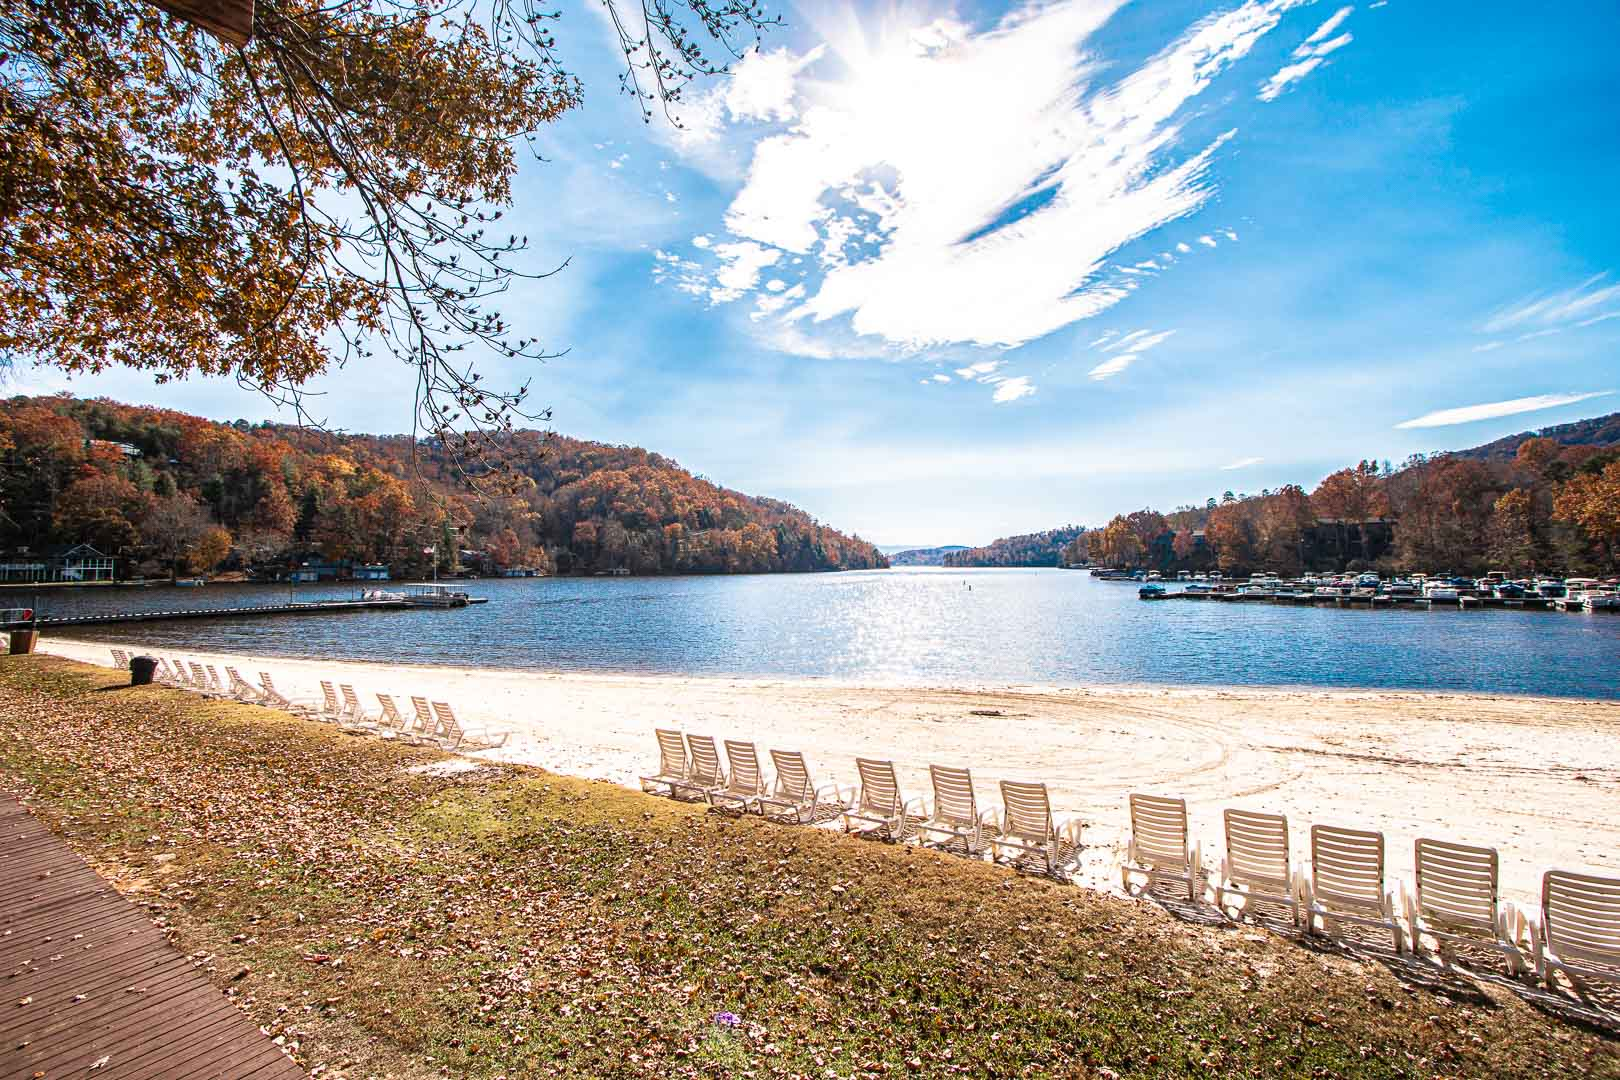 A relaxing lake view at VRI's Fox Run Resort in North Carolina.